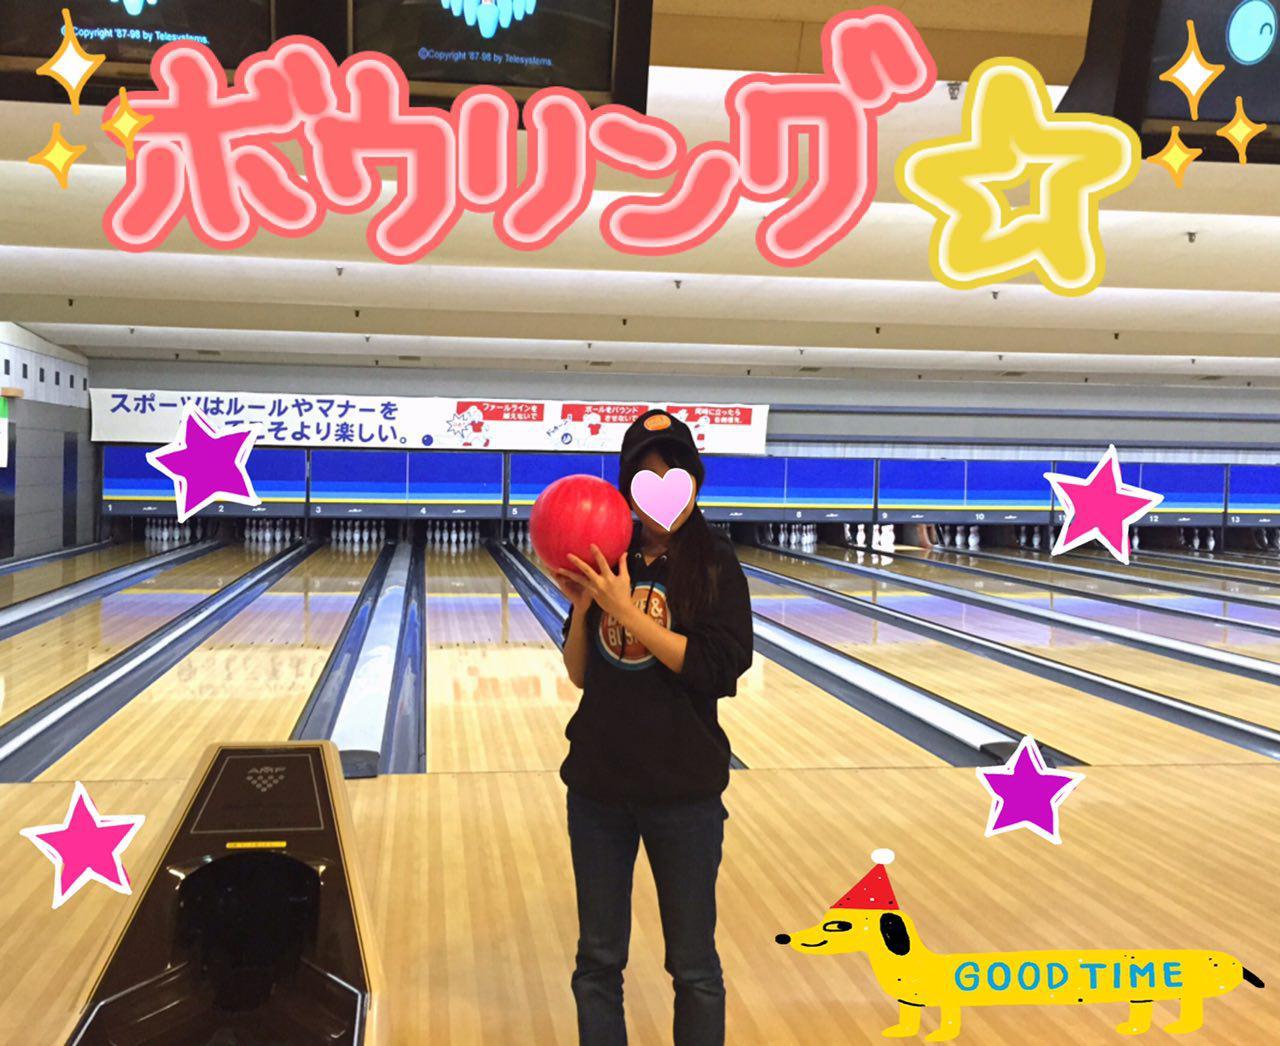 photo_2017-04-16_23-27-14.jpg